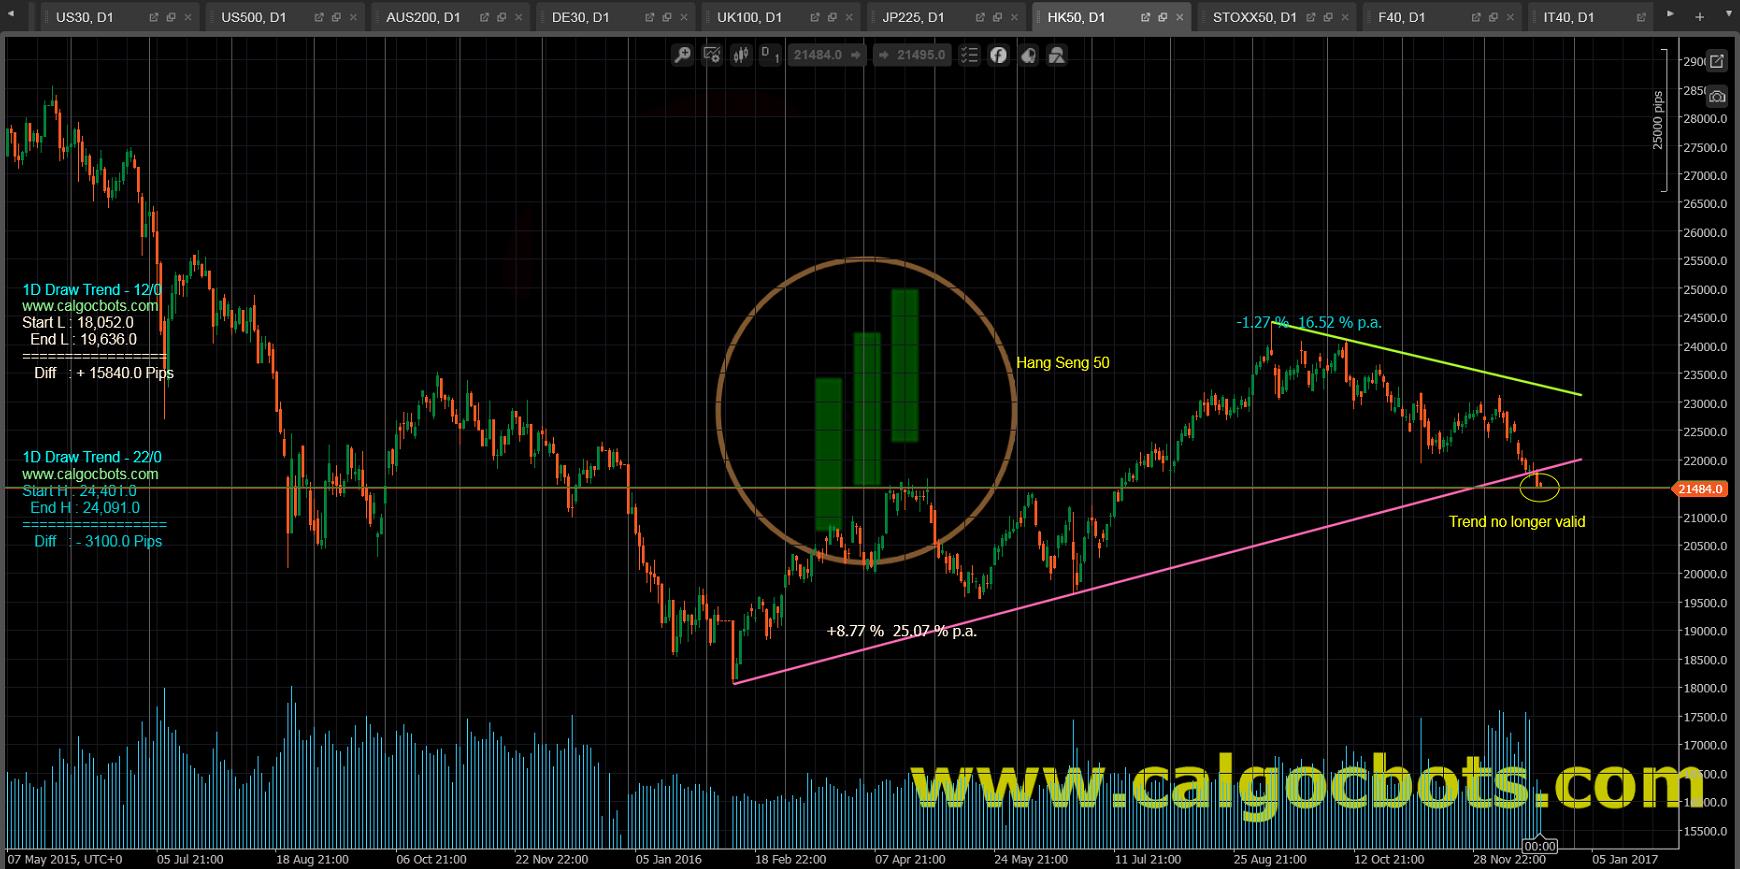 1D Draw Trend - cAlgo and cTrader Indicator - Hang Seng 50 Index Hong Kong Stock Exchange Index 恒生指數 Daily Chart - 003